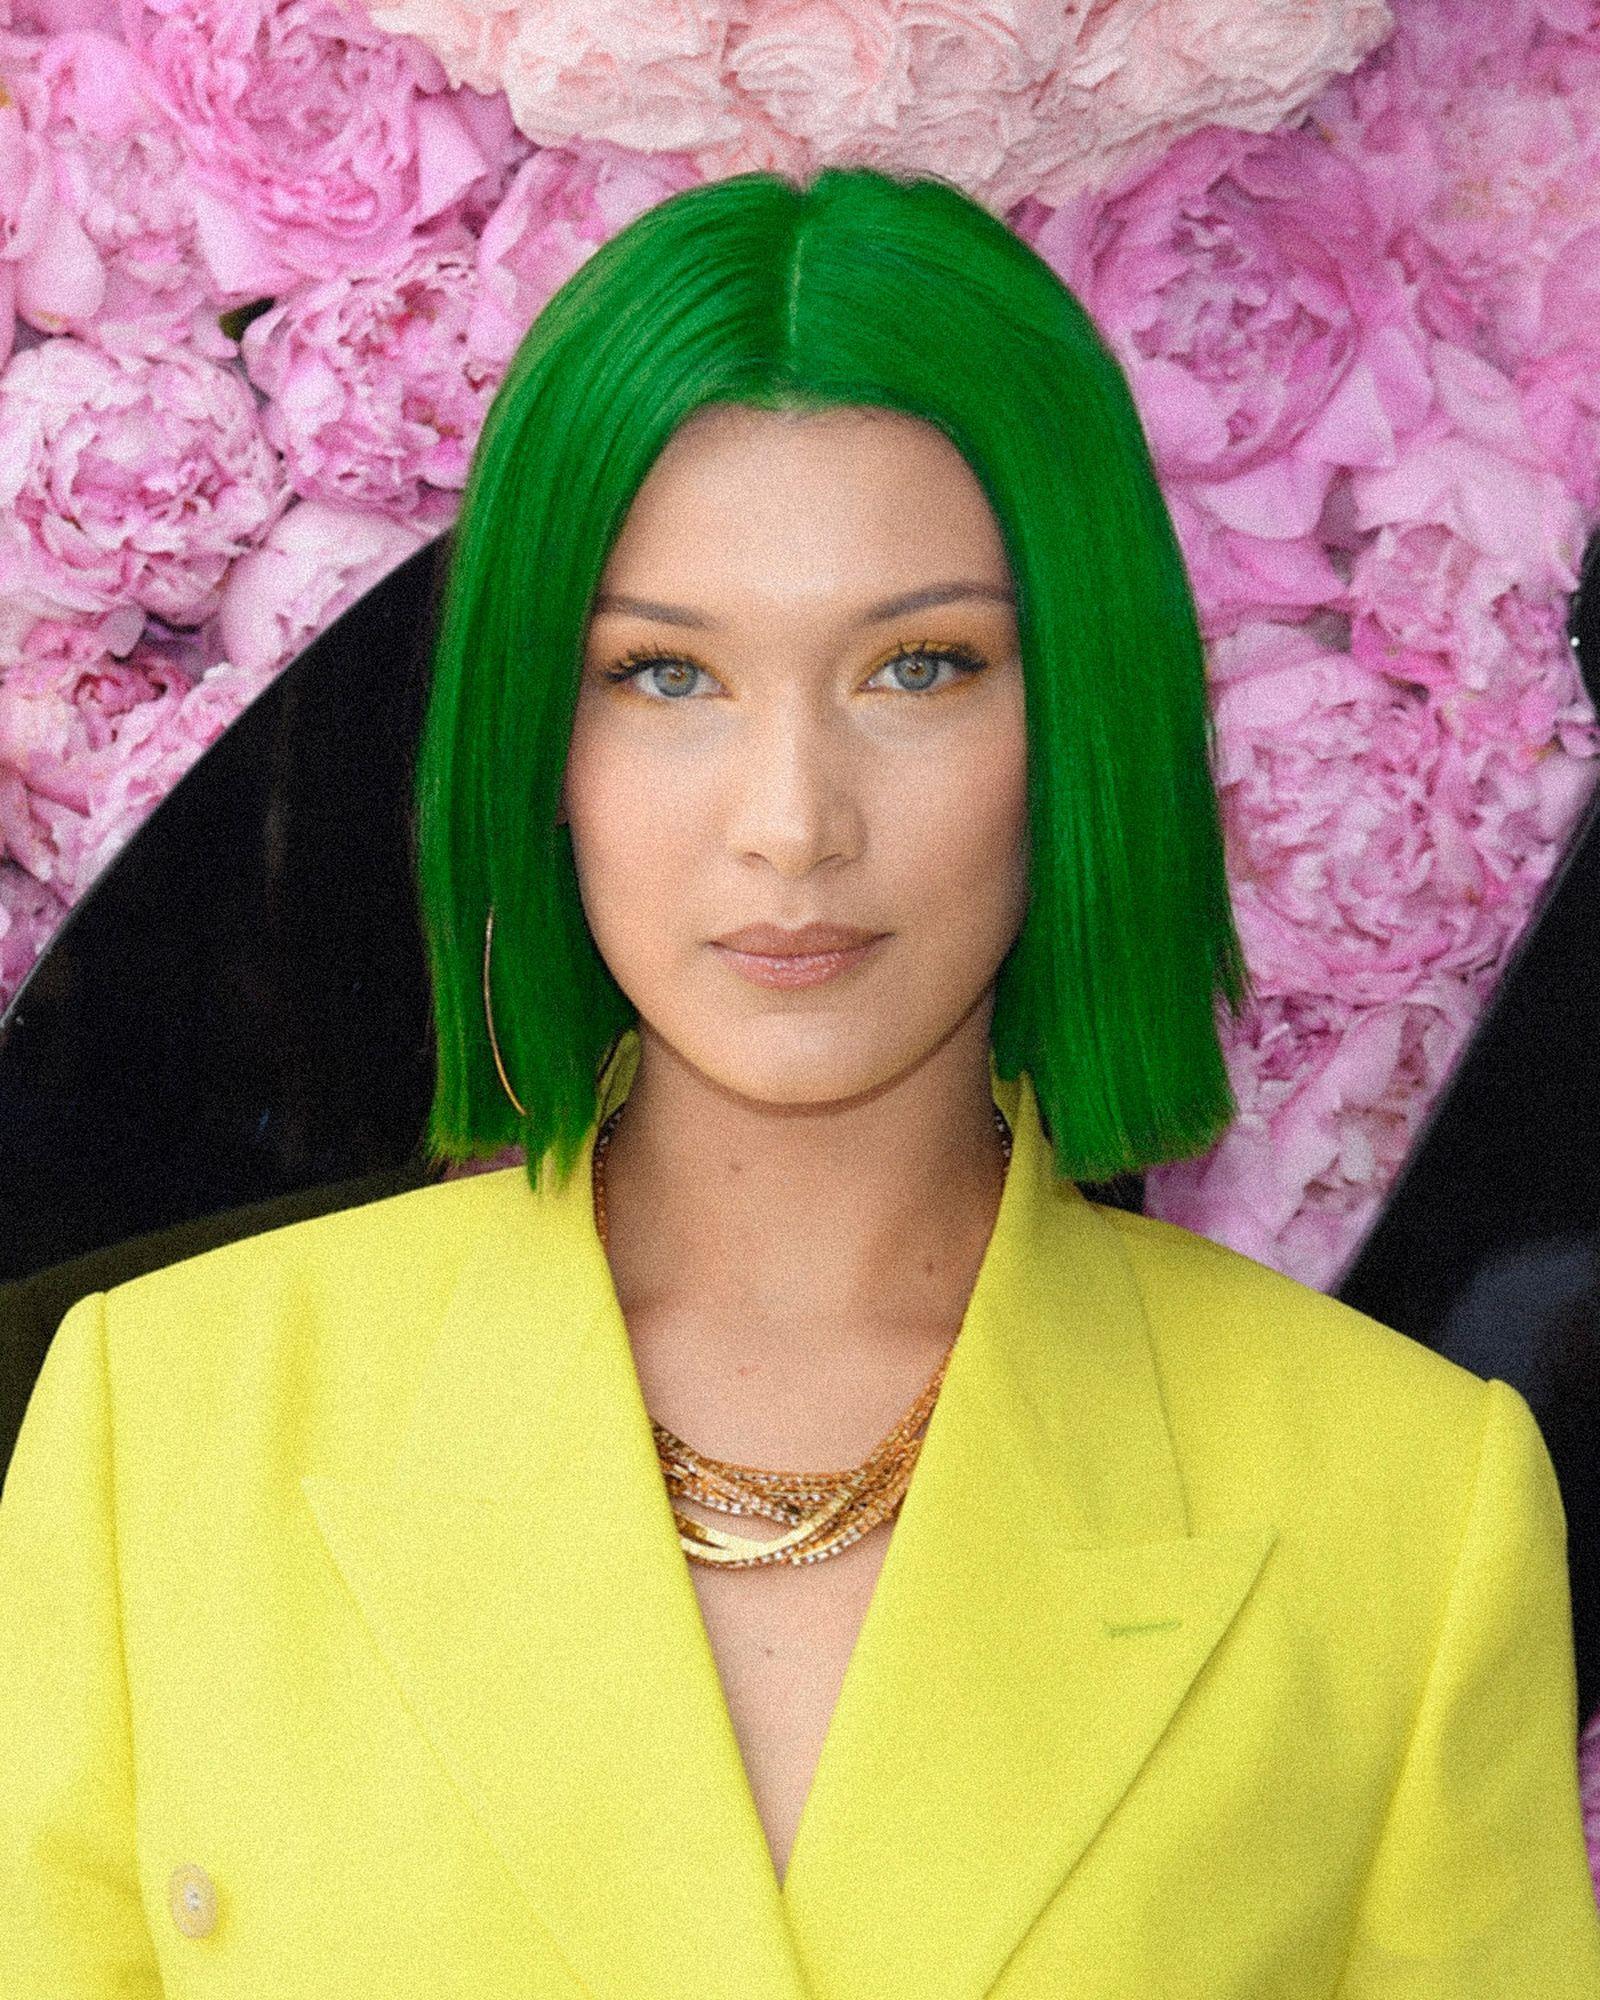 sgp-hair-dye-Bella_Hadid_green_FIN